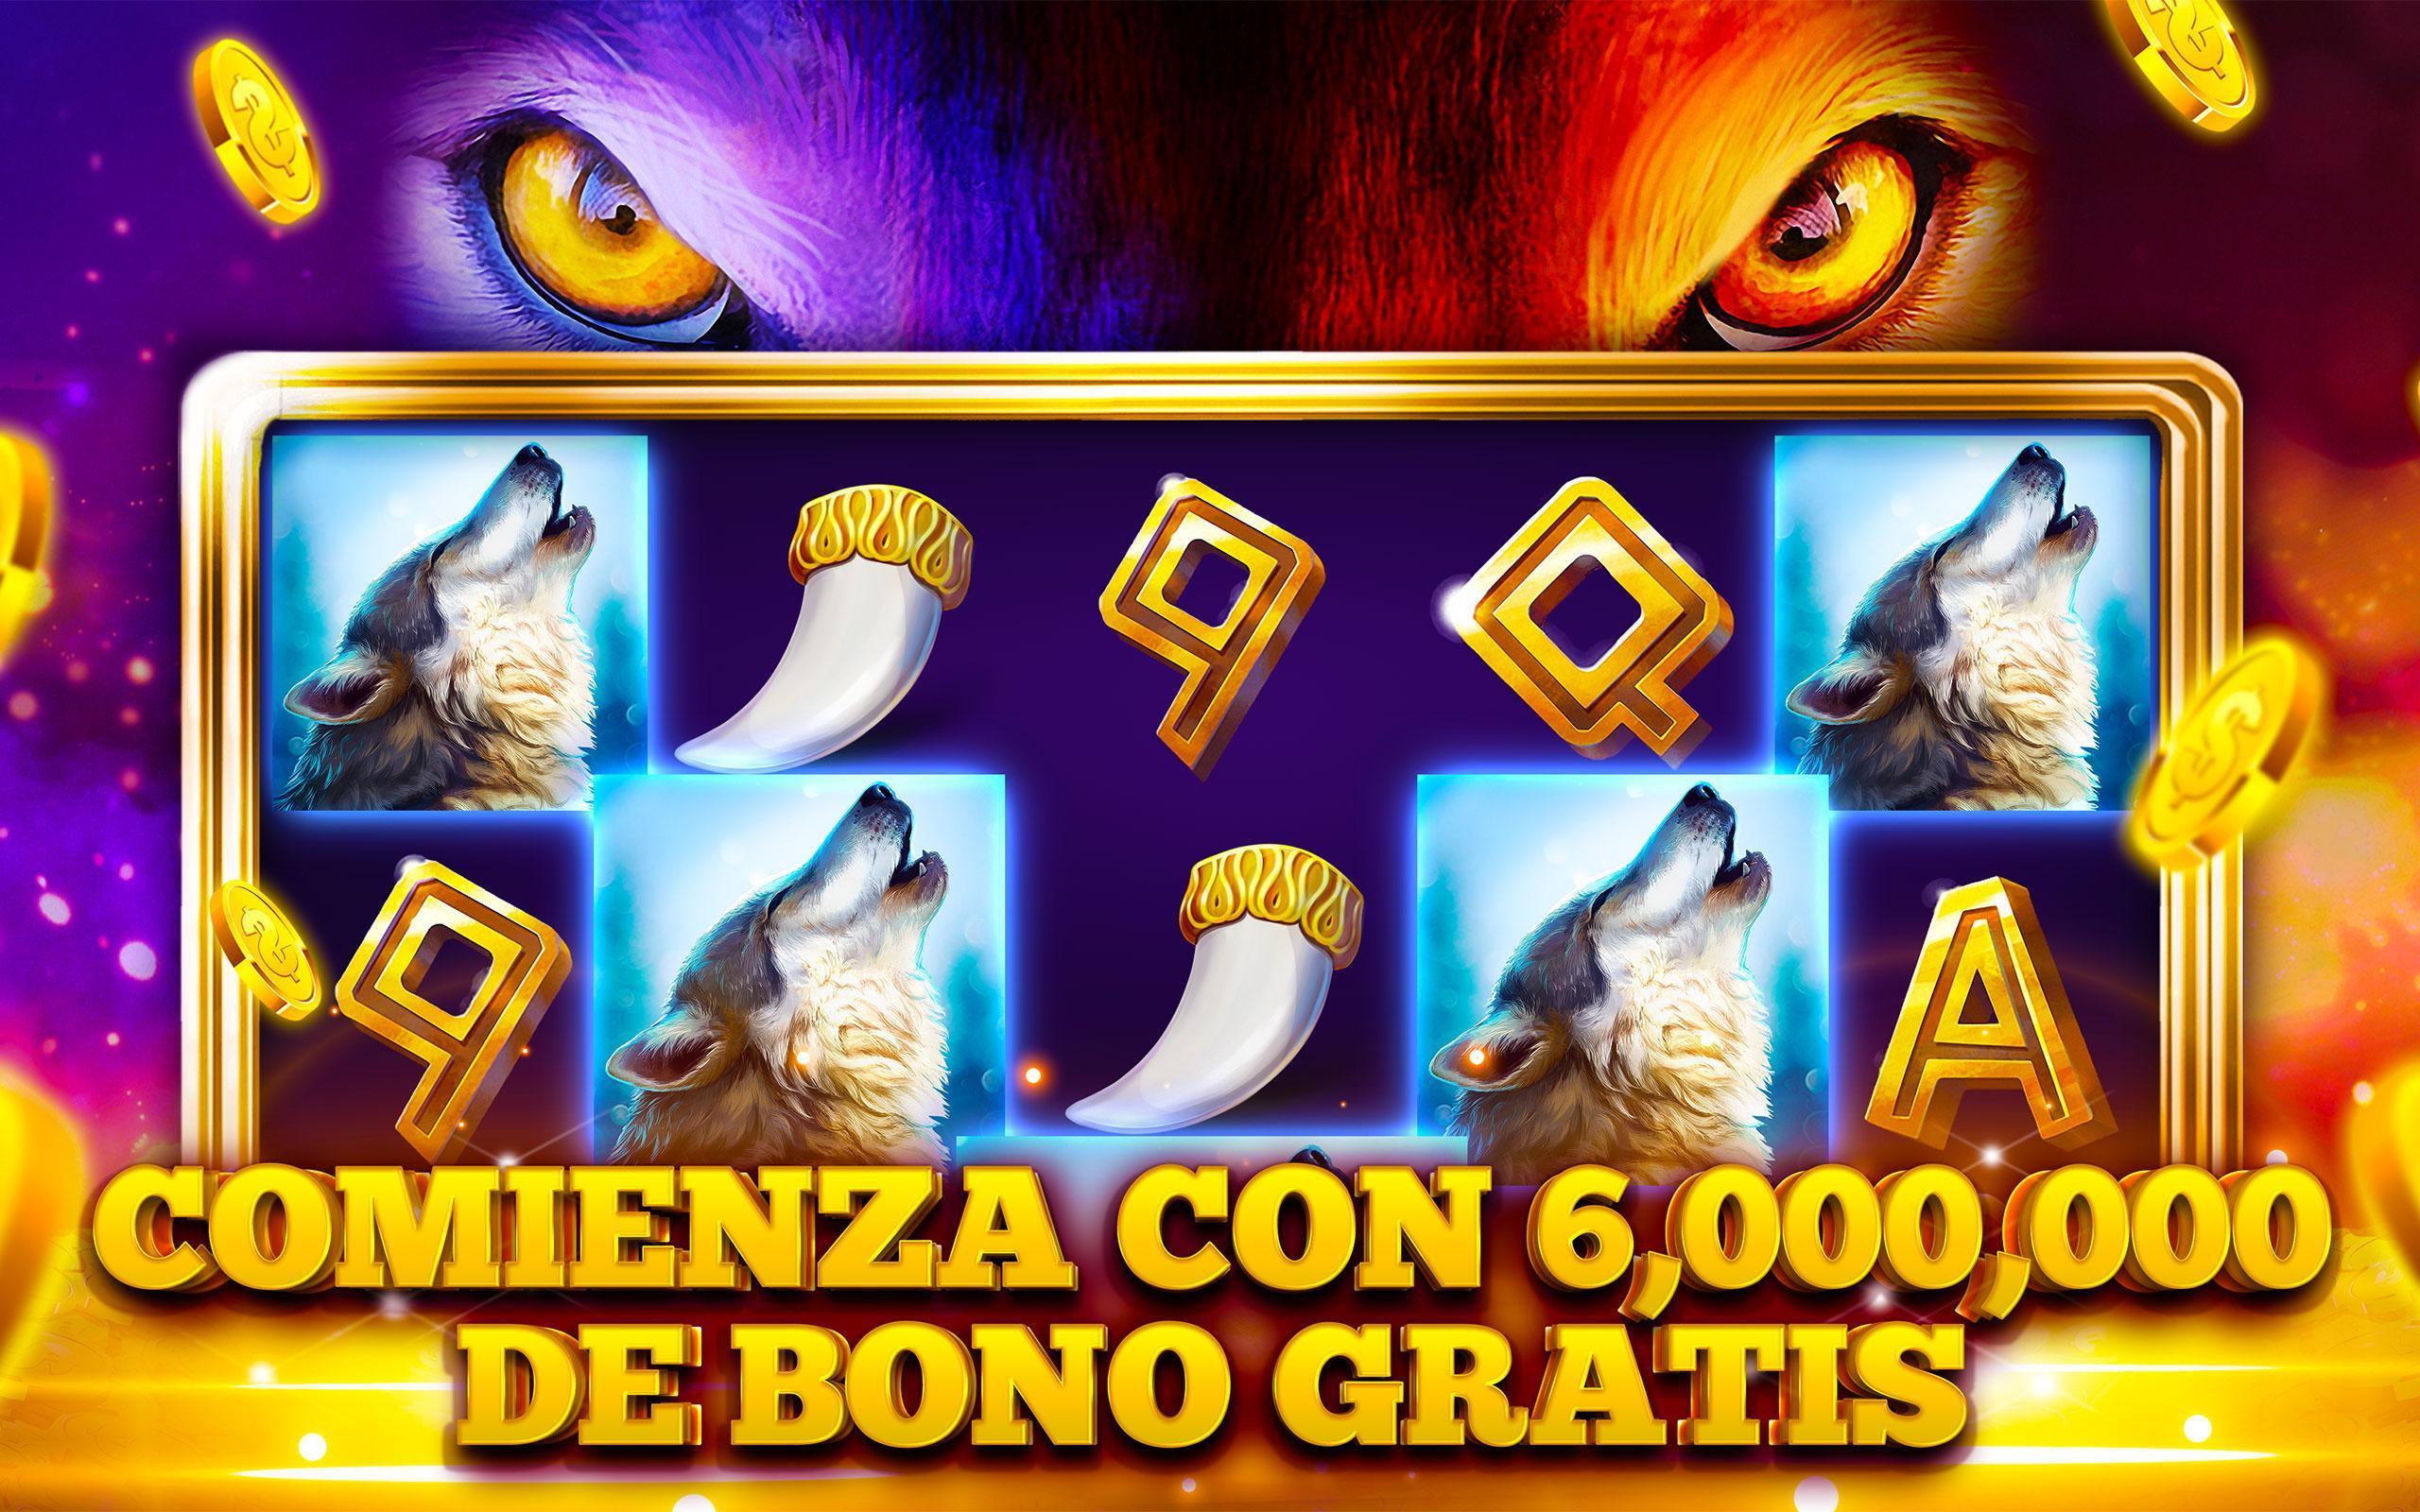 Juegos de casino gratis tragamonedas wolf run